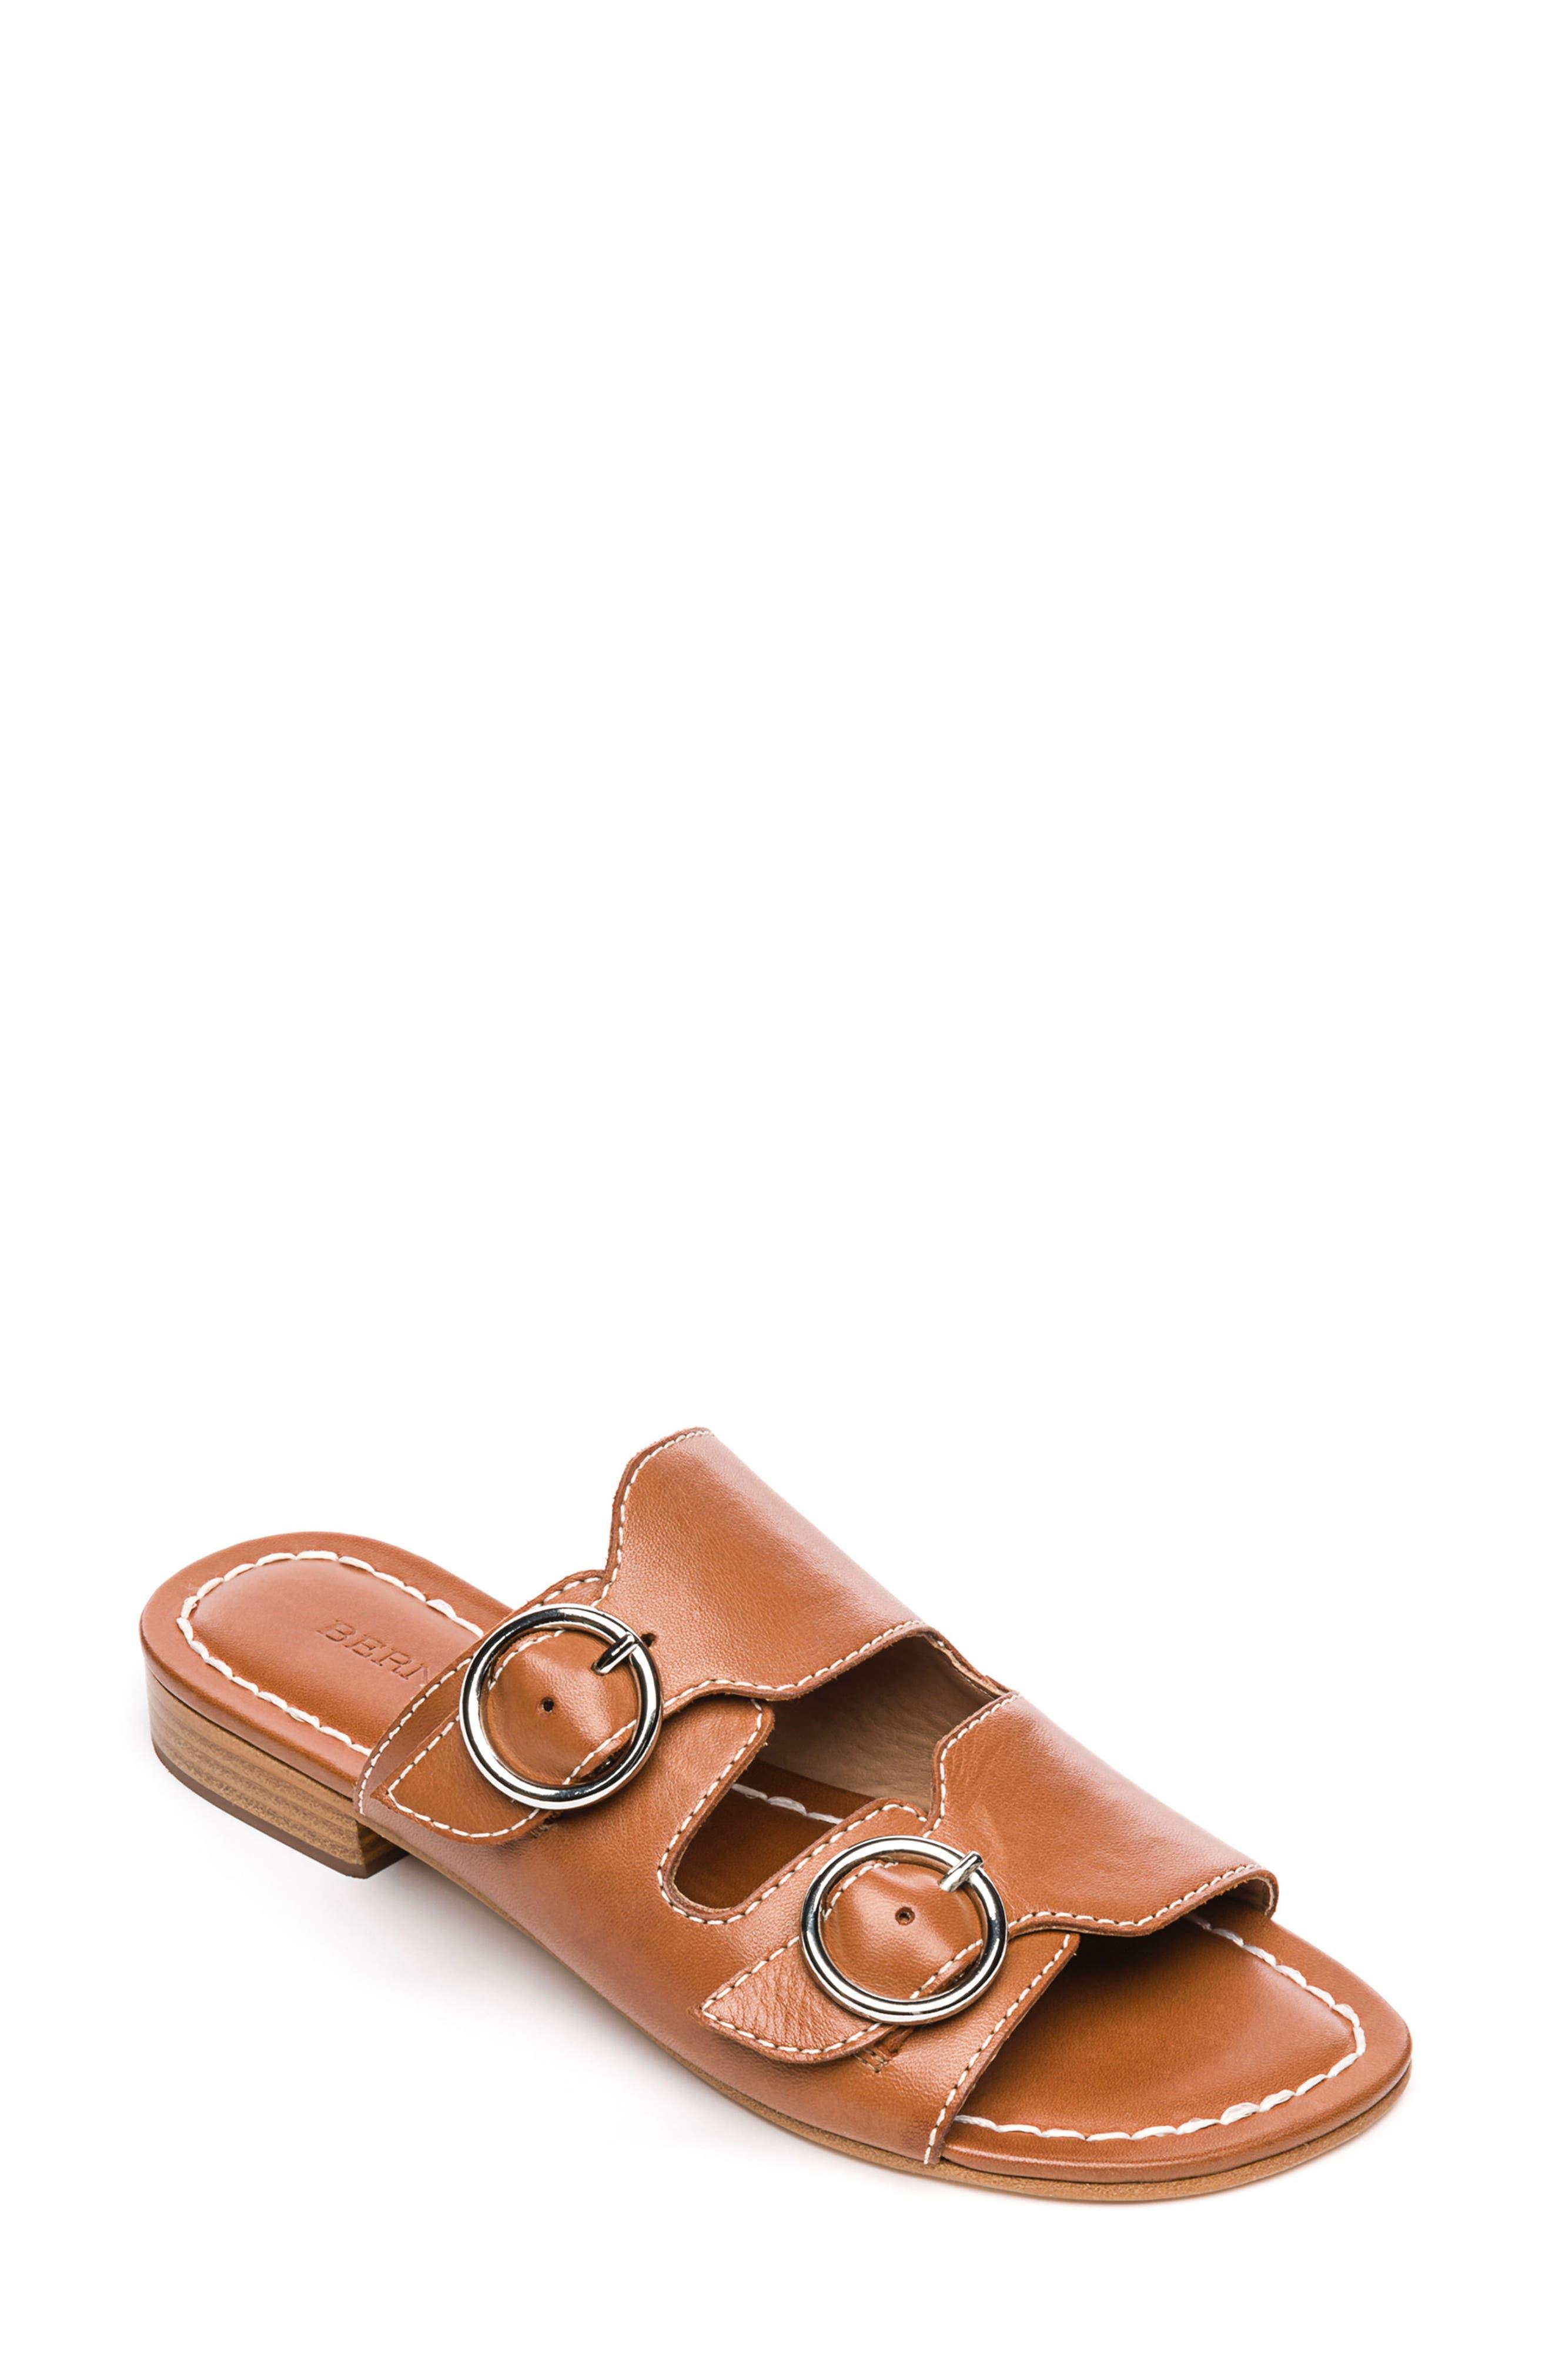 Bernardo Tobi Slide Sandal,                             Main thumbnail 1, color,                             Luggage Leather